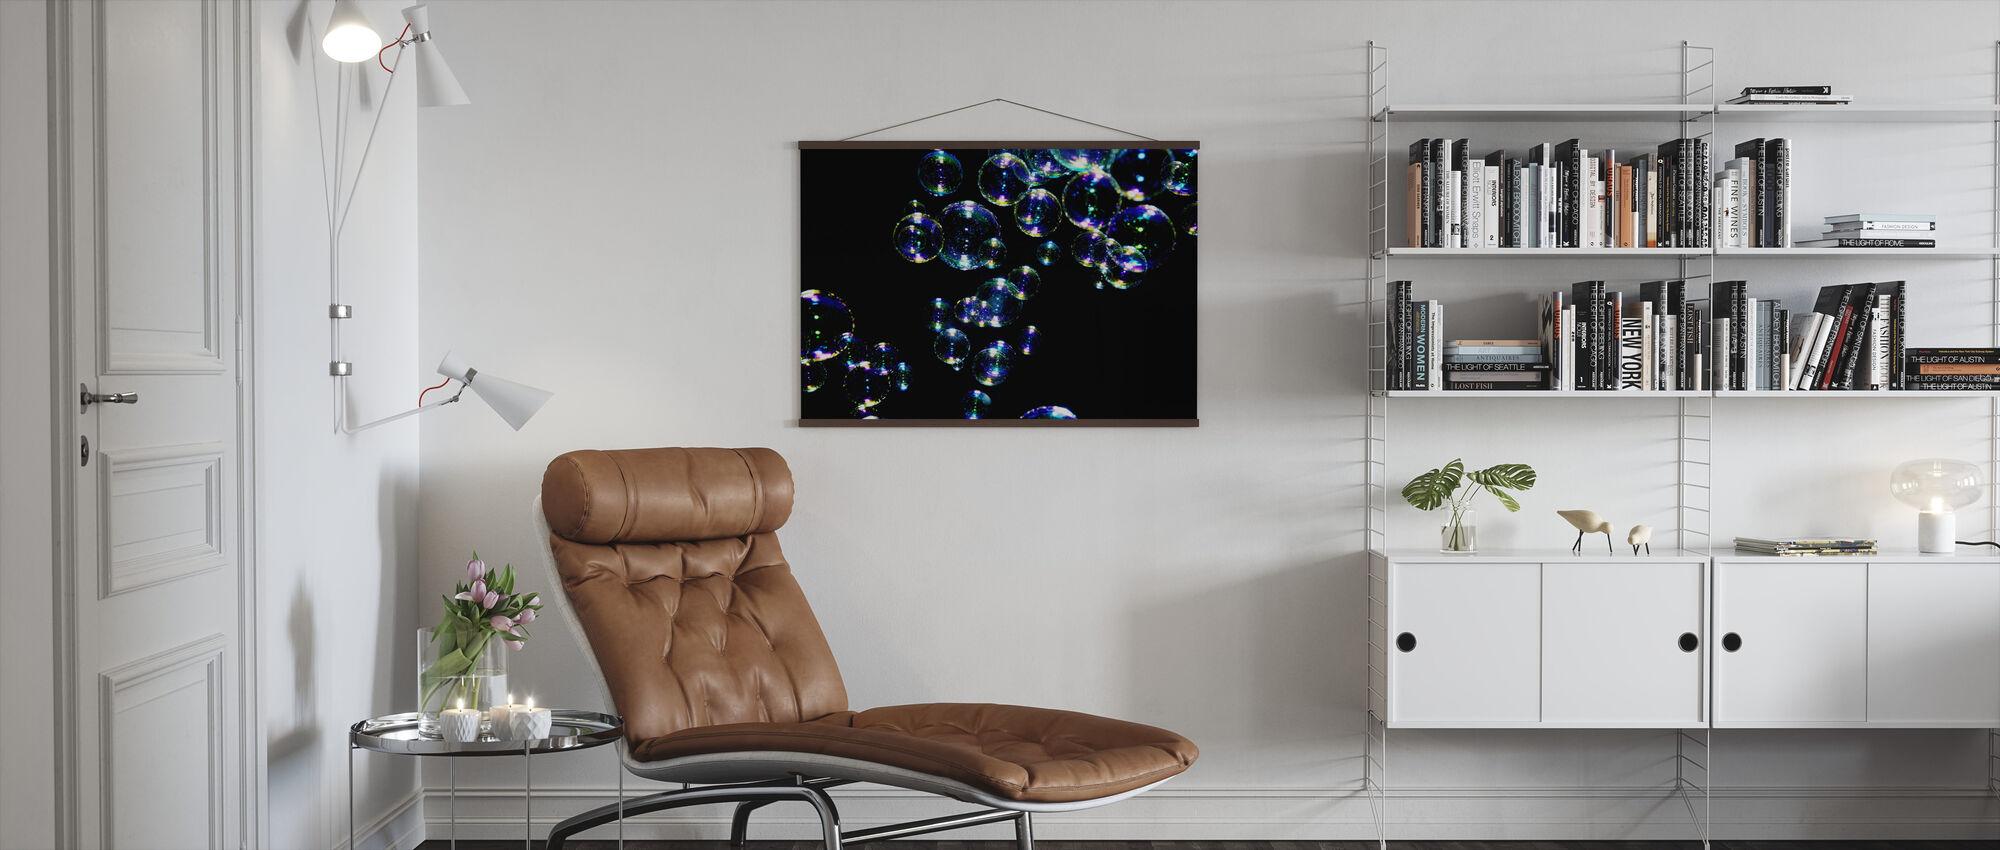 Glistening Bubbles - Poster - Living Room